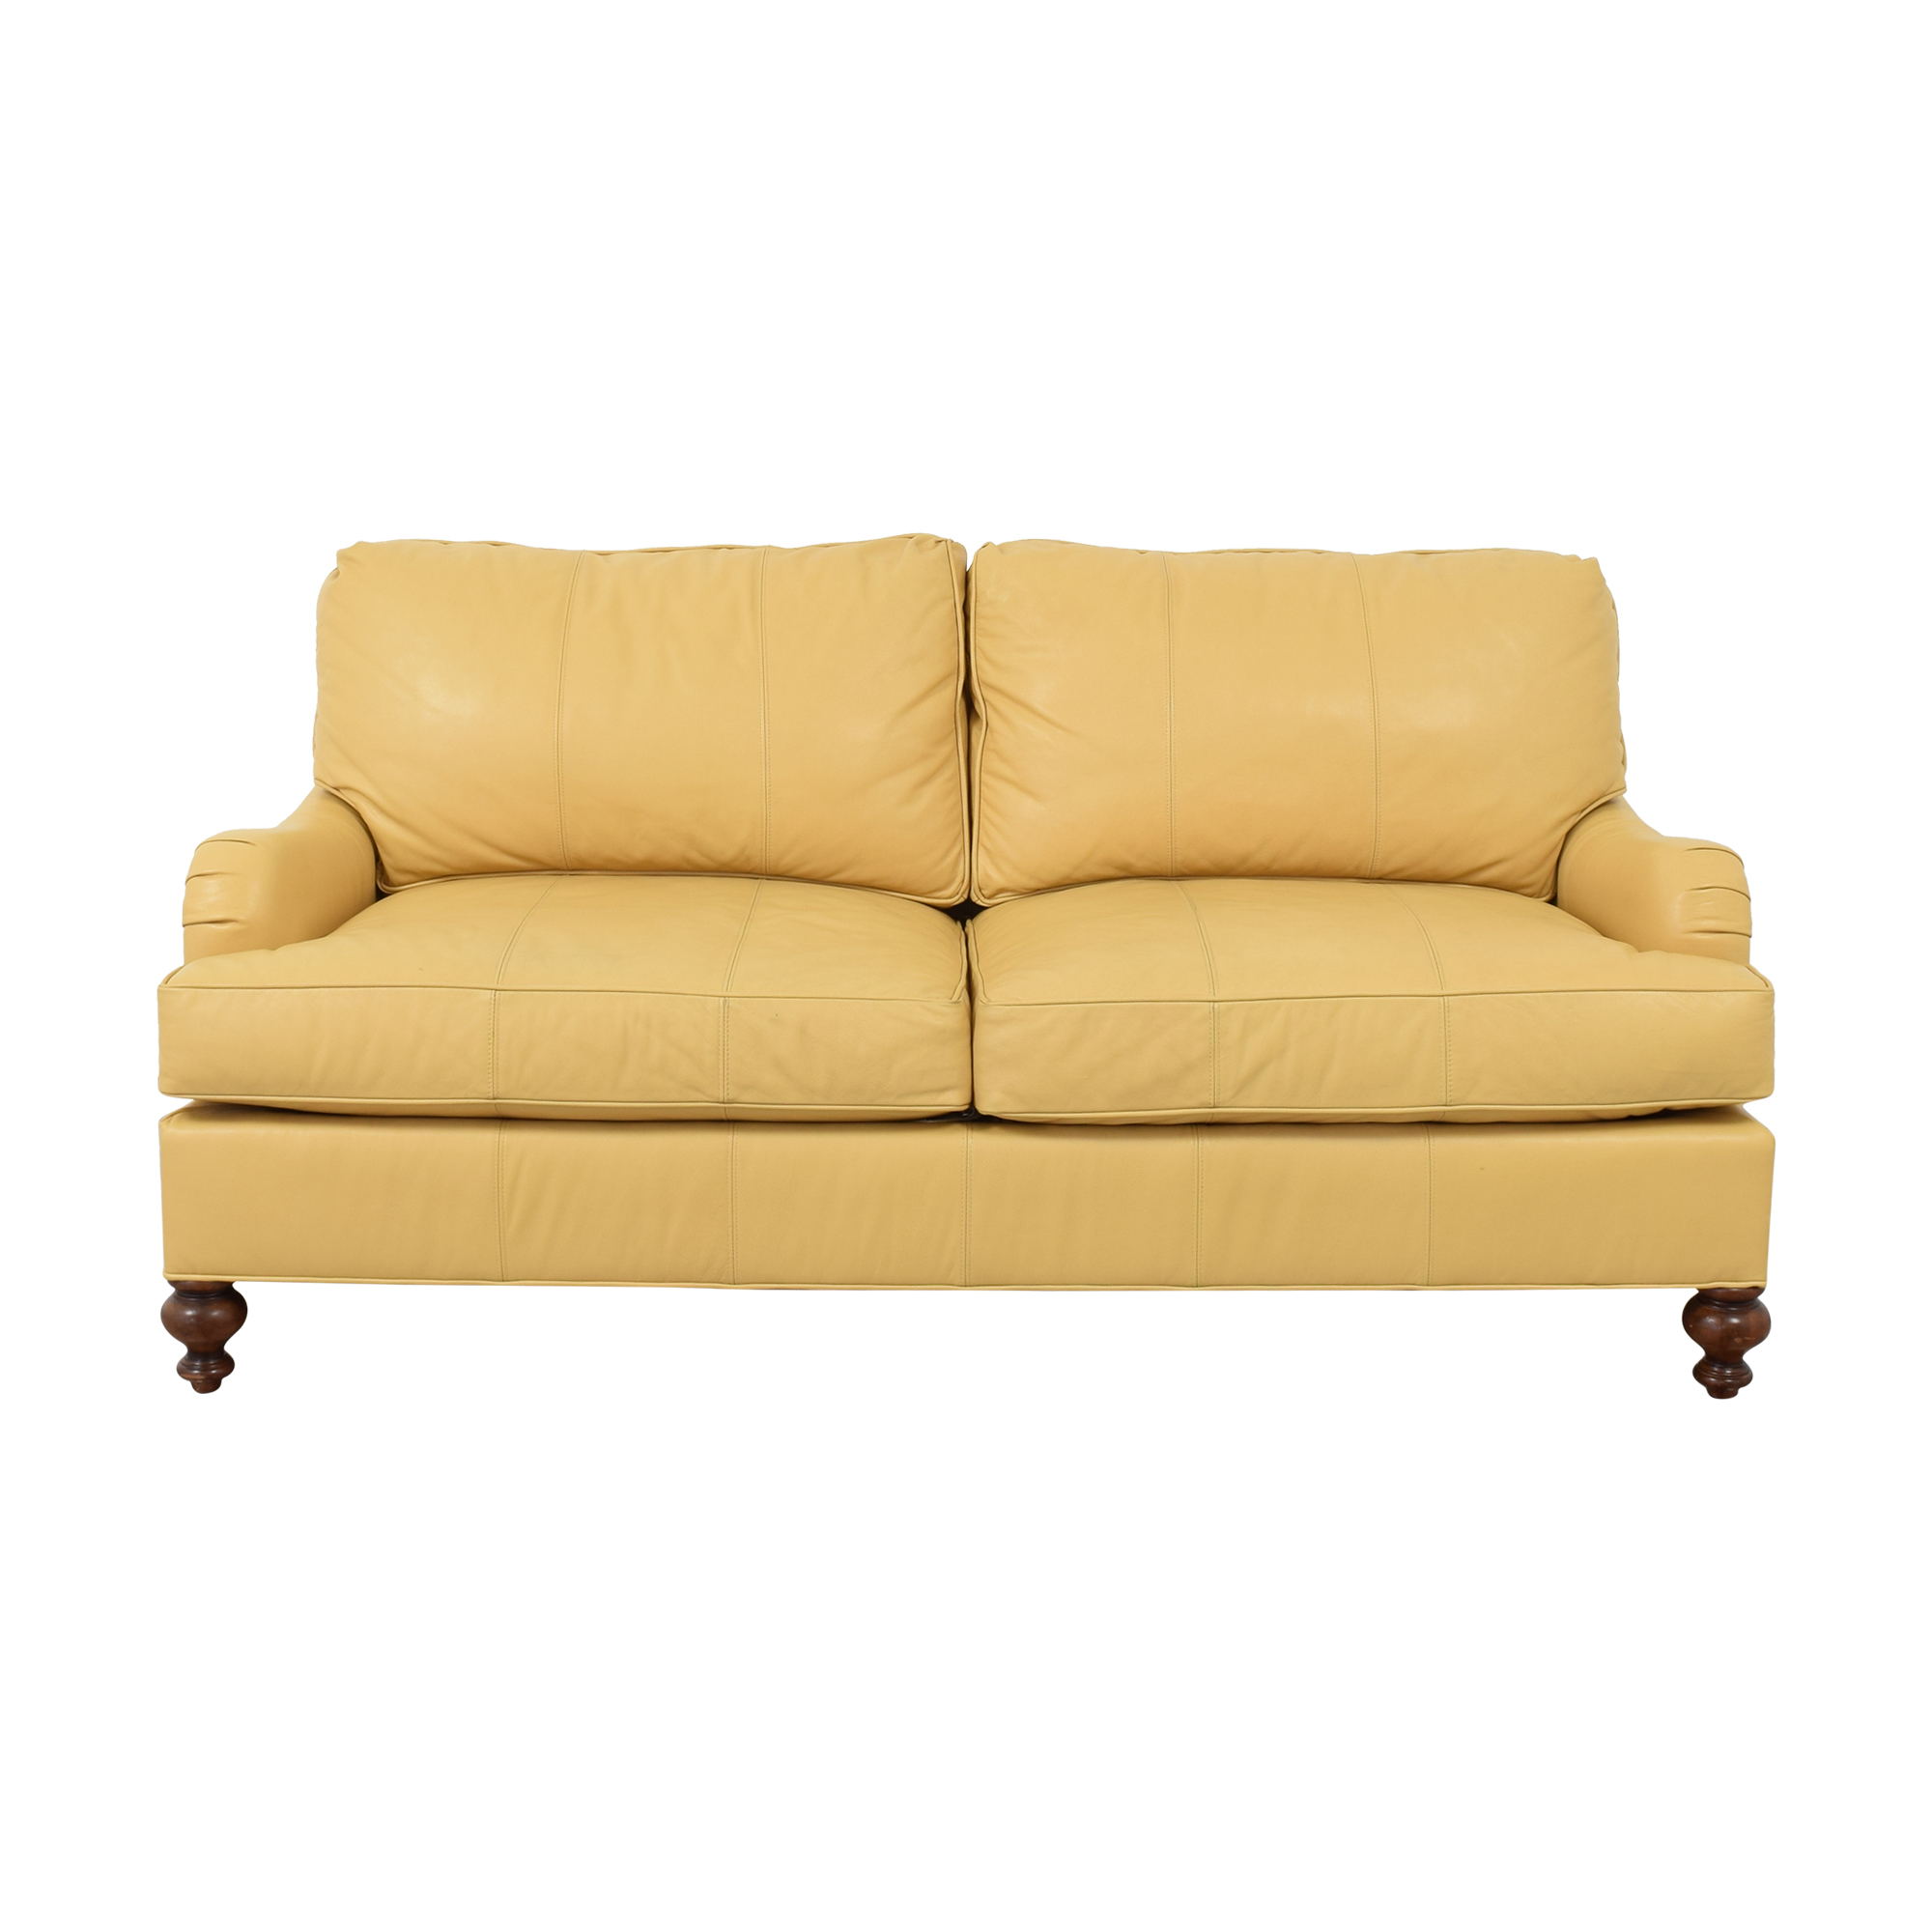 buy Wesley Hall Wesley Hall English Roll Arm Two Cushion Sofa online